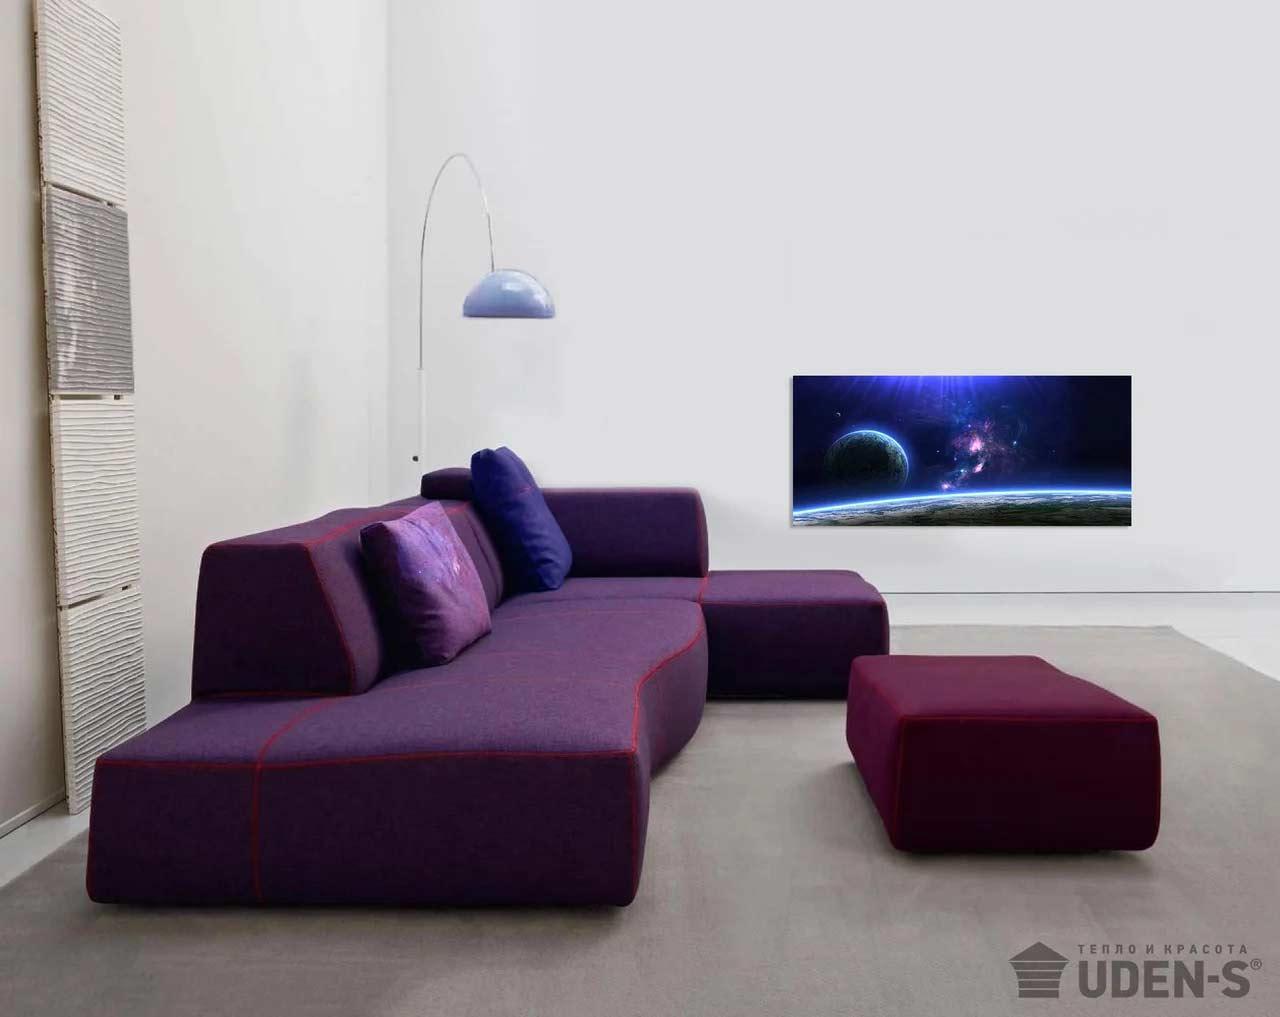 Panou-Radiant-Uden-s-Imprimat-Foto-700W-Universul-int